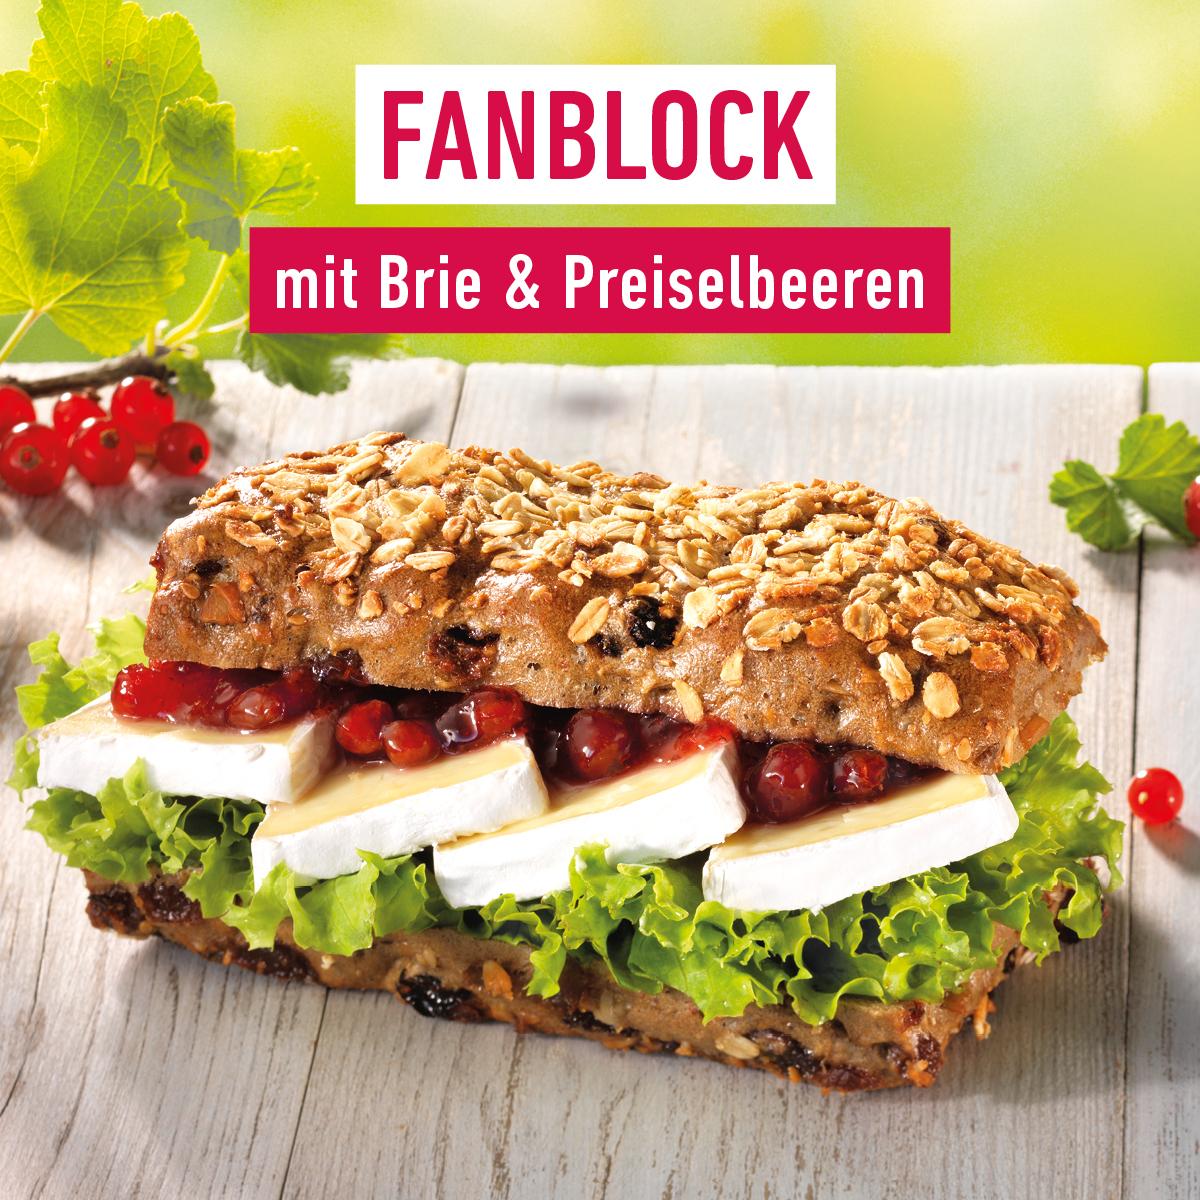 FANBLOCK mit Brie & Preiselbeeren